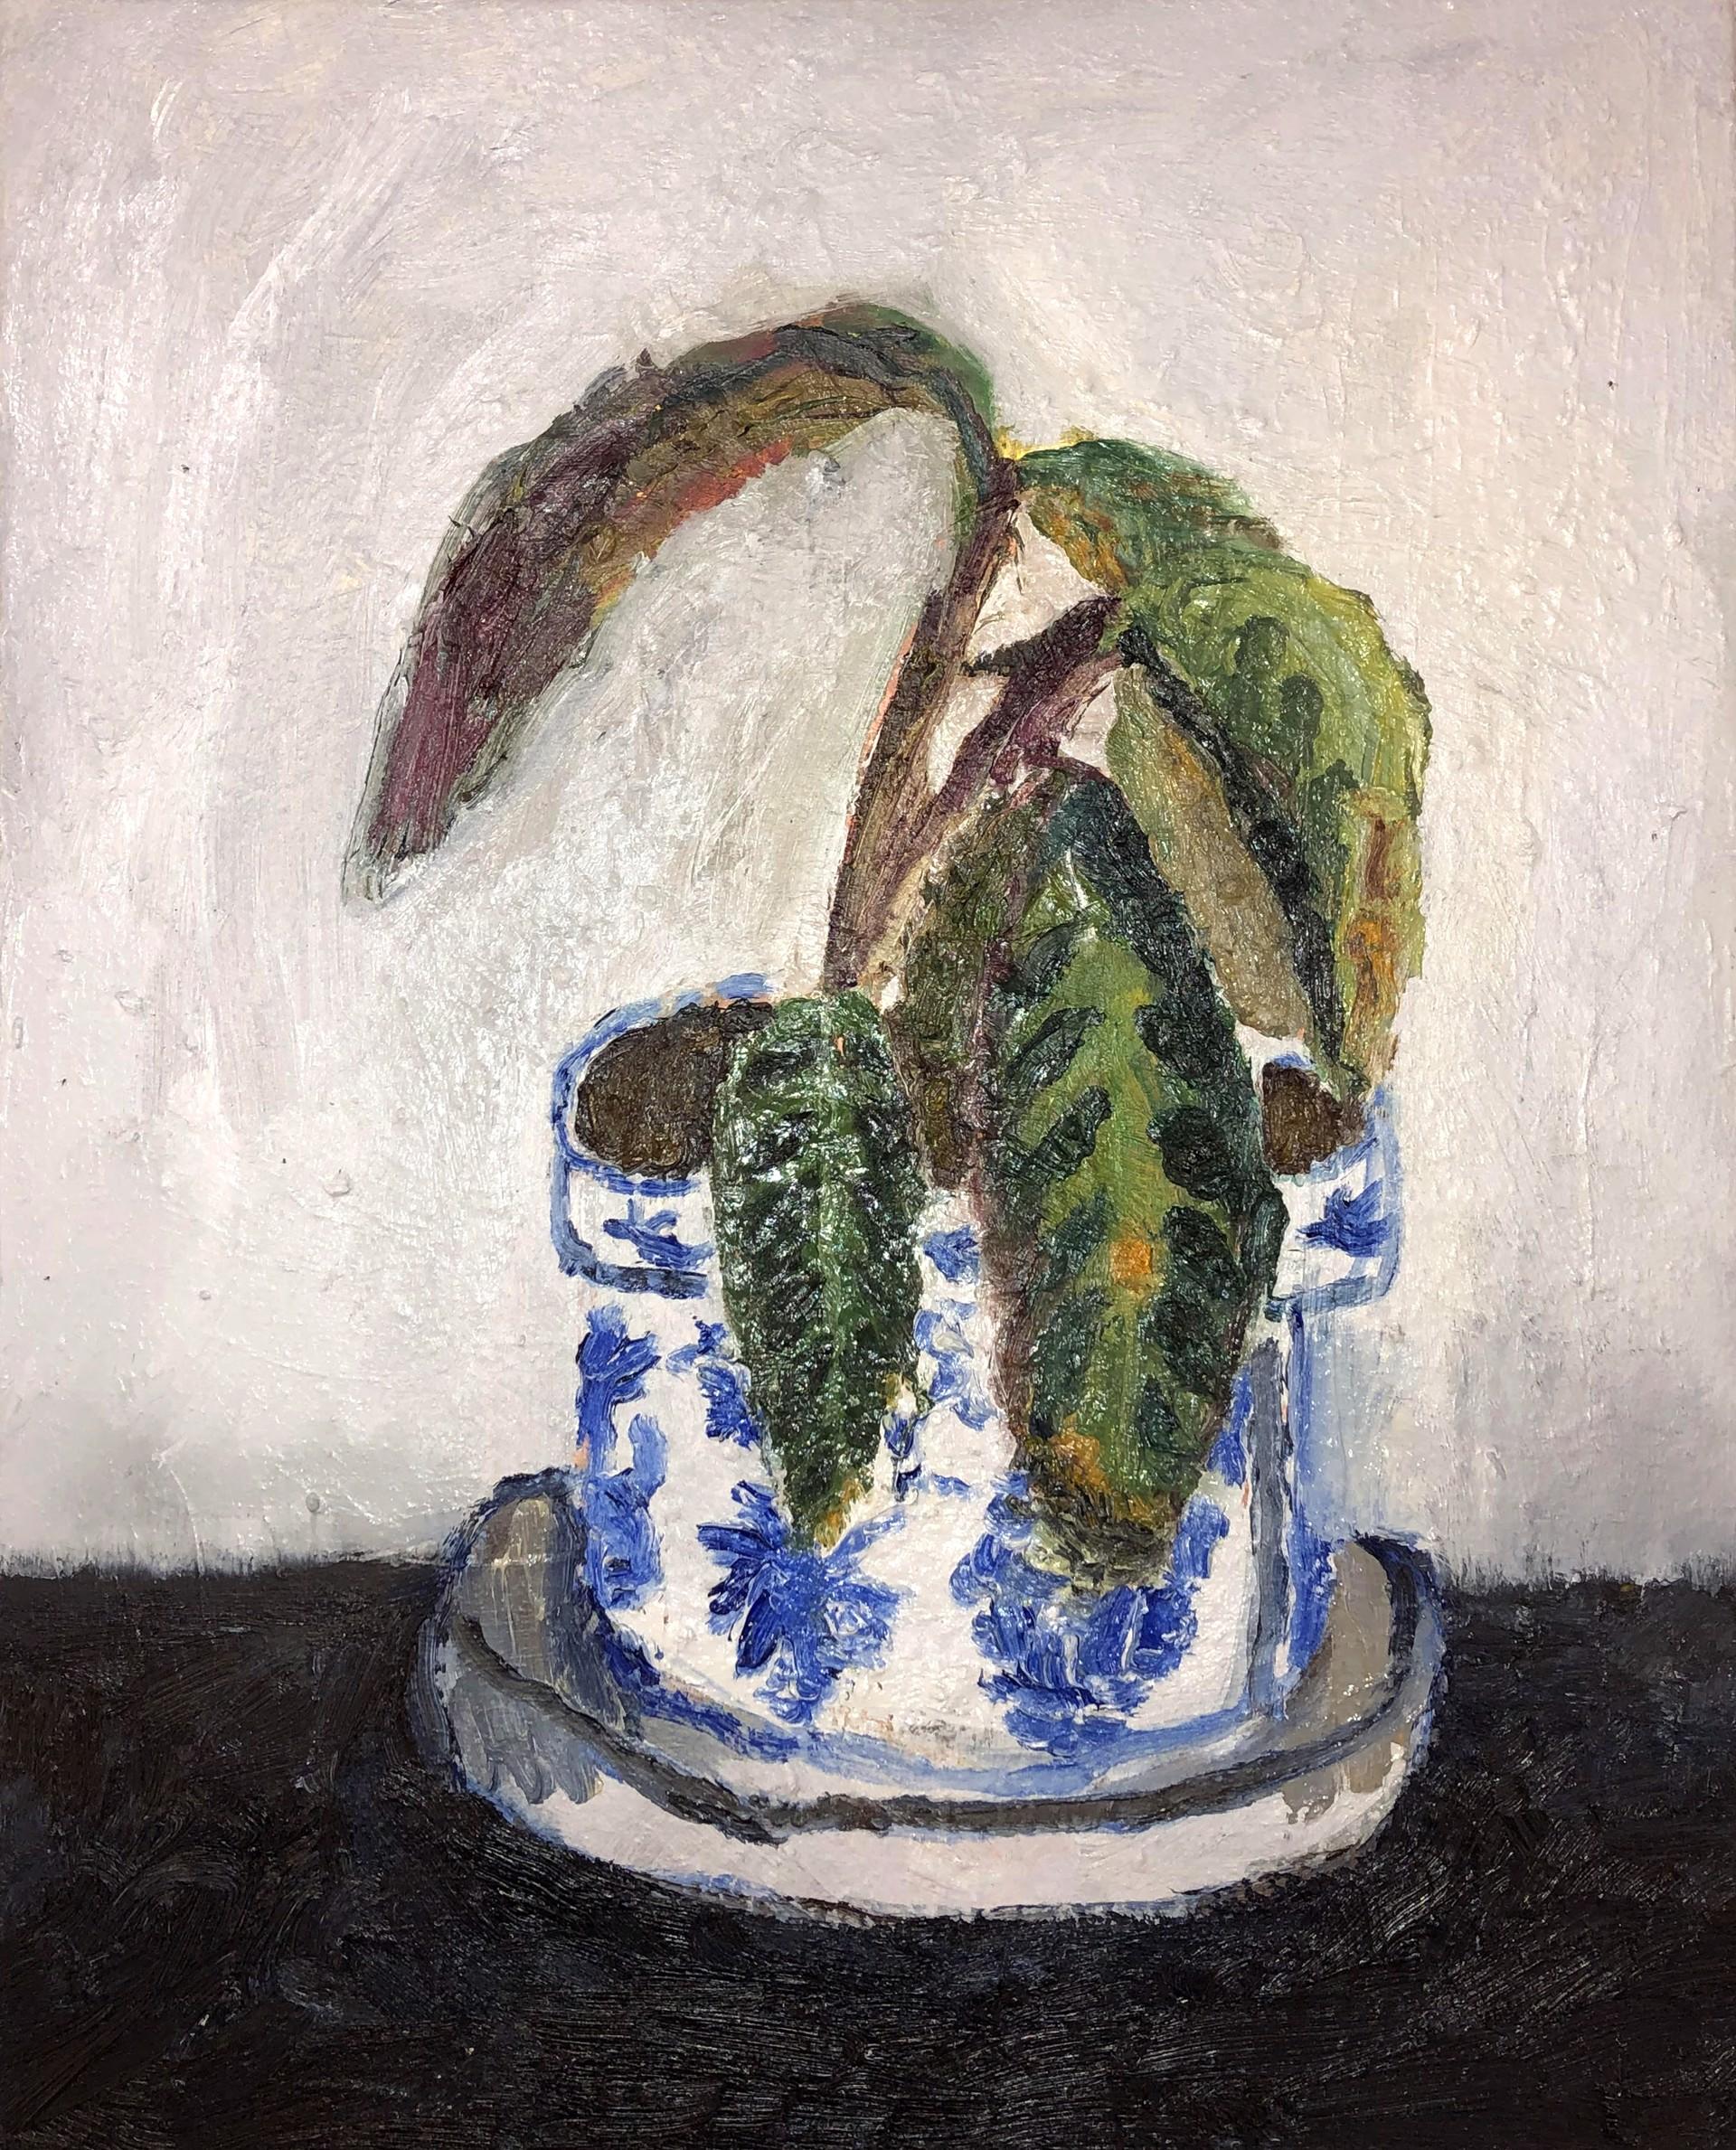 Aaron Maier-Carretero - Still Life #5 by Visiting Artist